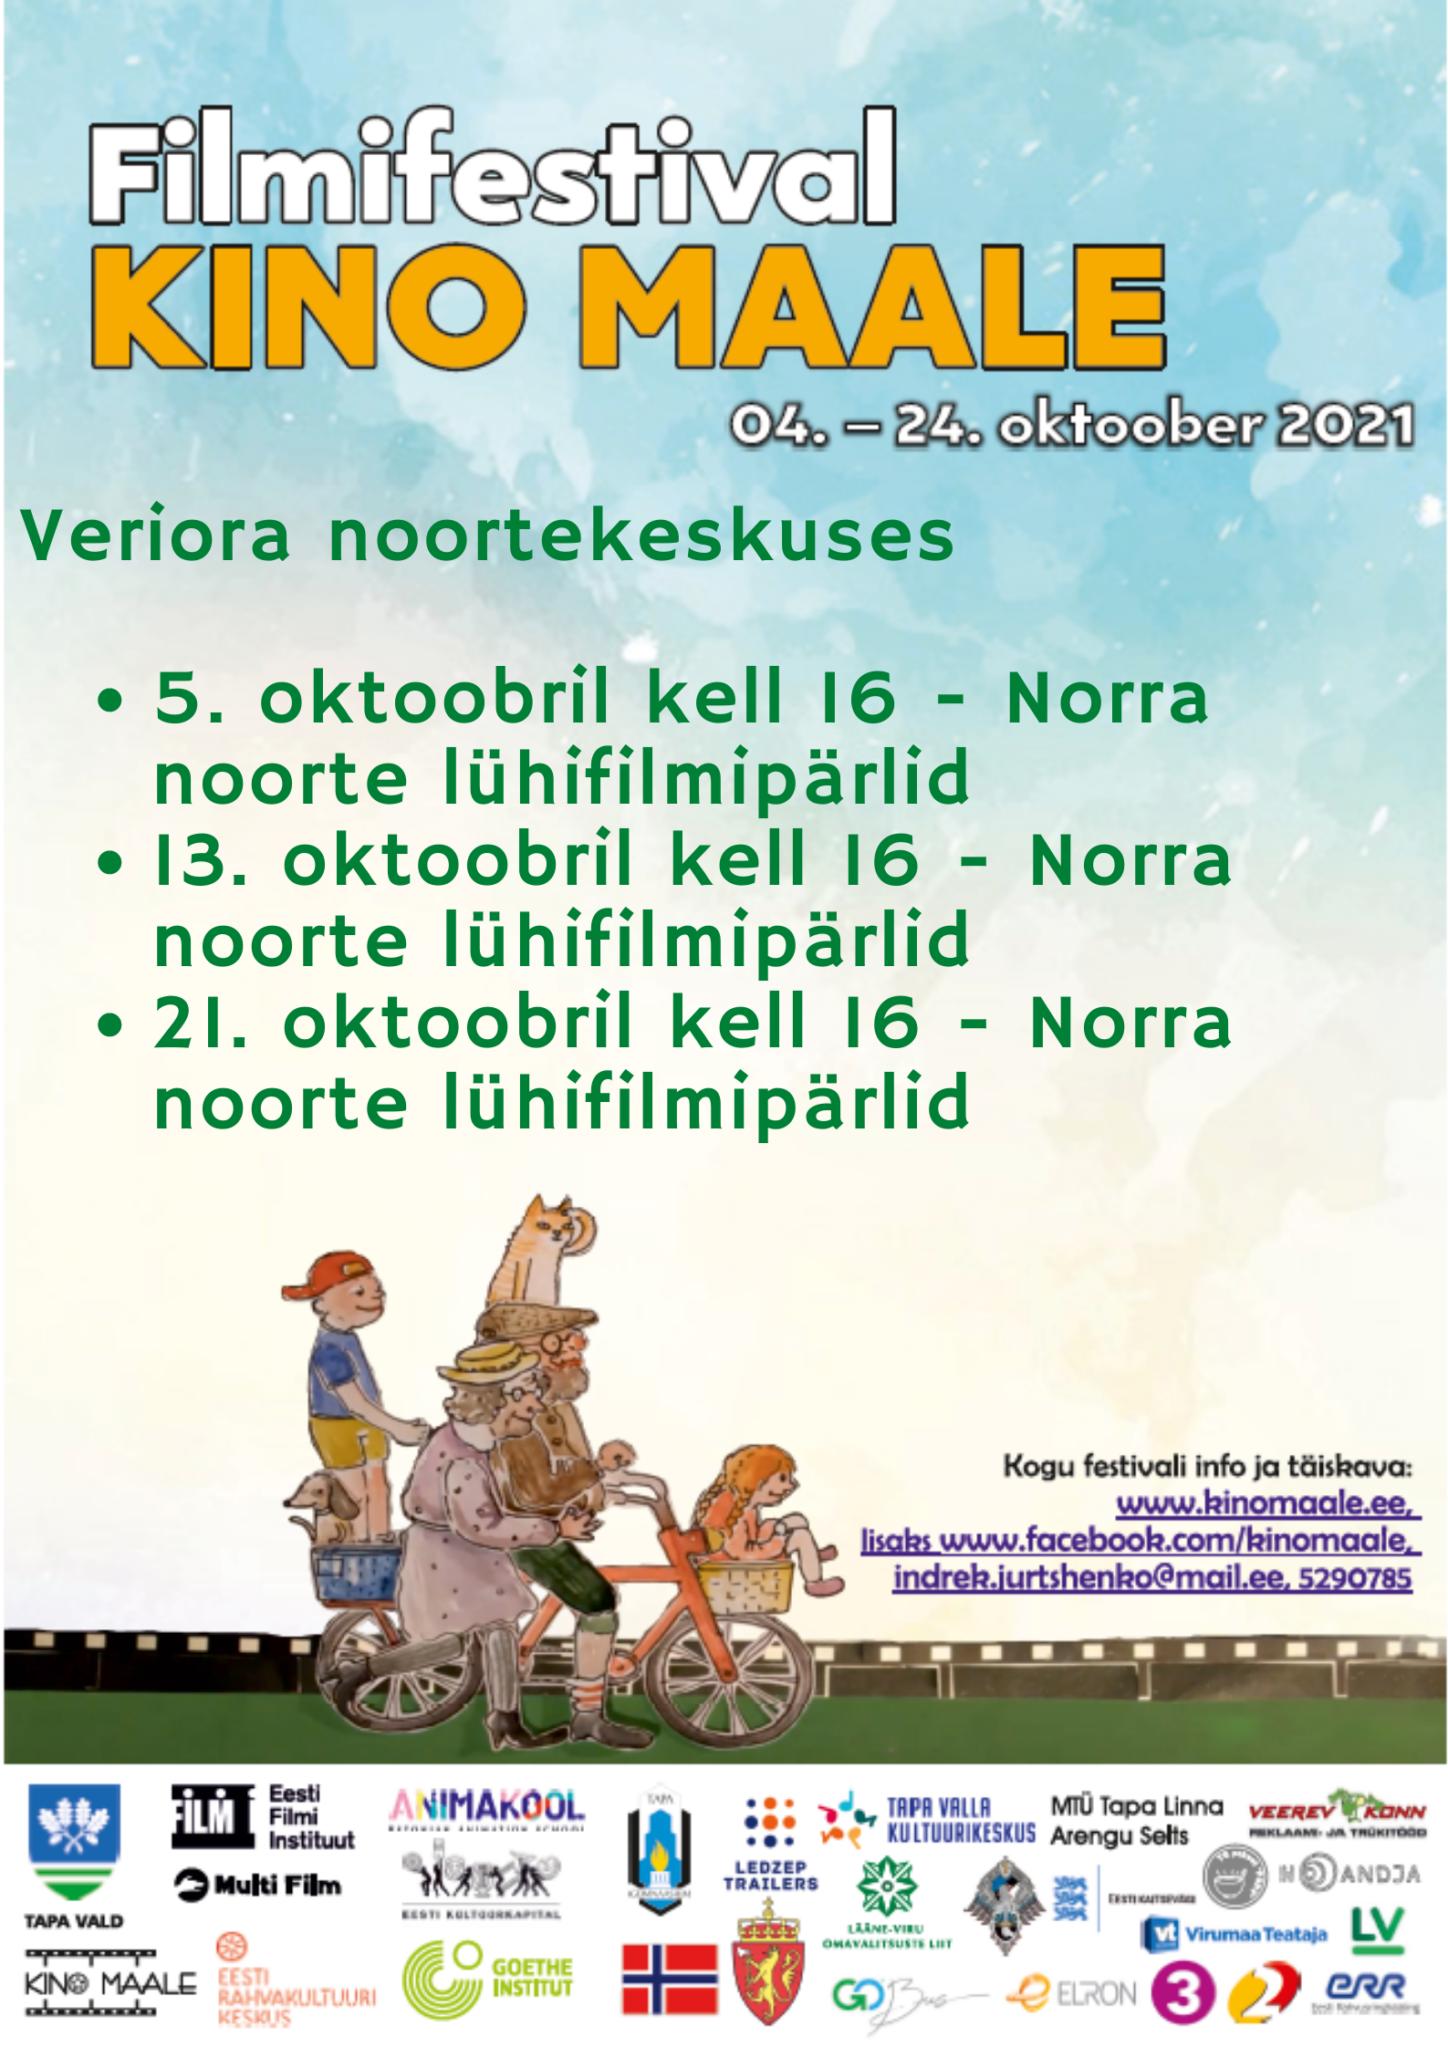 Filmifestival Kino maale: Norra noorte lühifilmipärlid @ Veriora noortekeskus | Veriora | Põlva maakond | Eesti